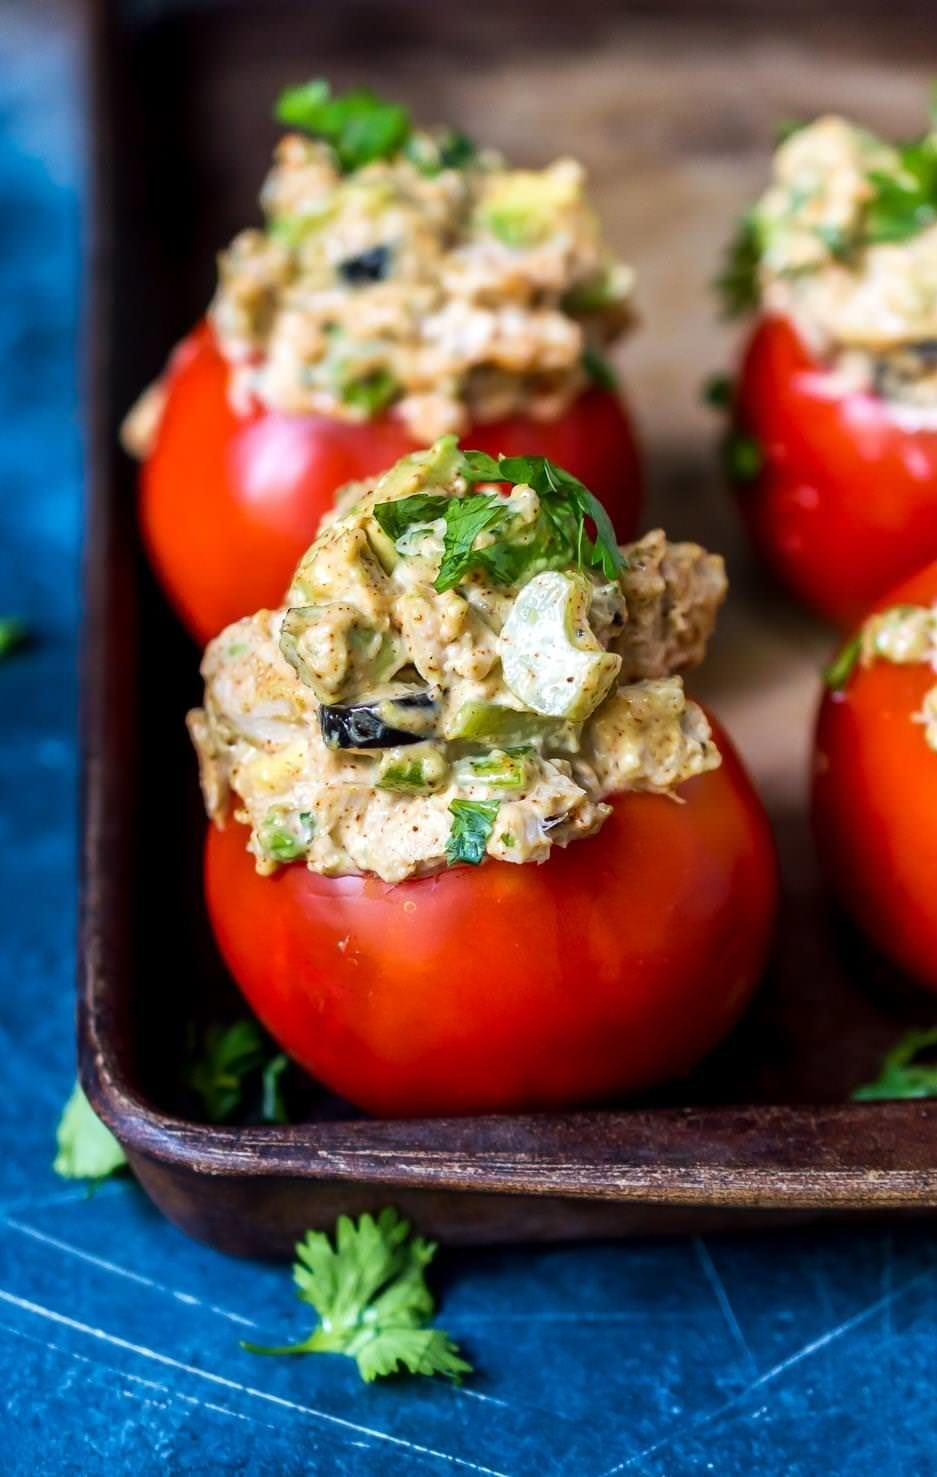 taco tuna stuffed tomatoes topped with fresh cilantro